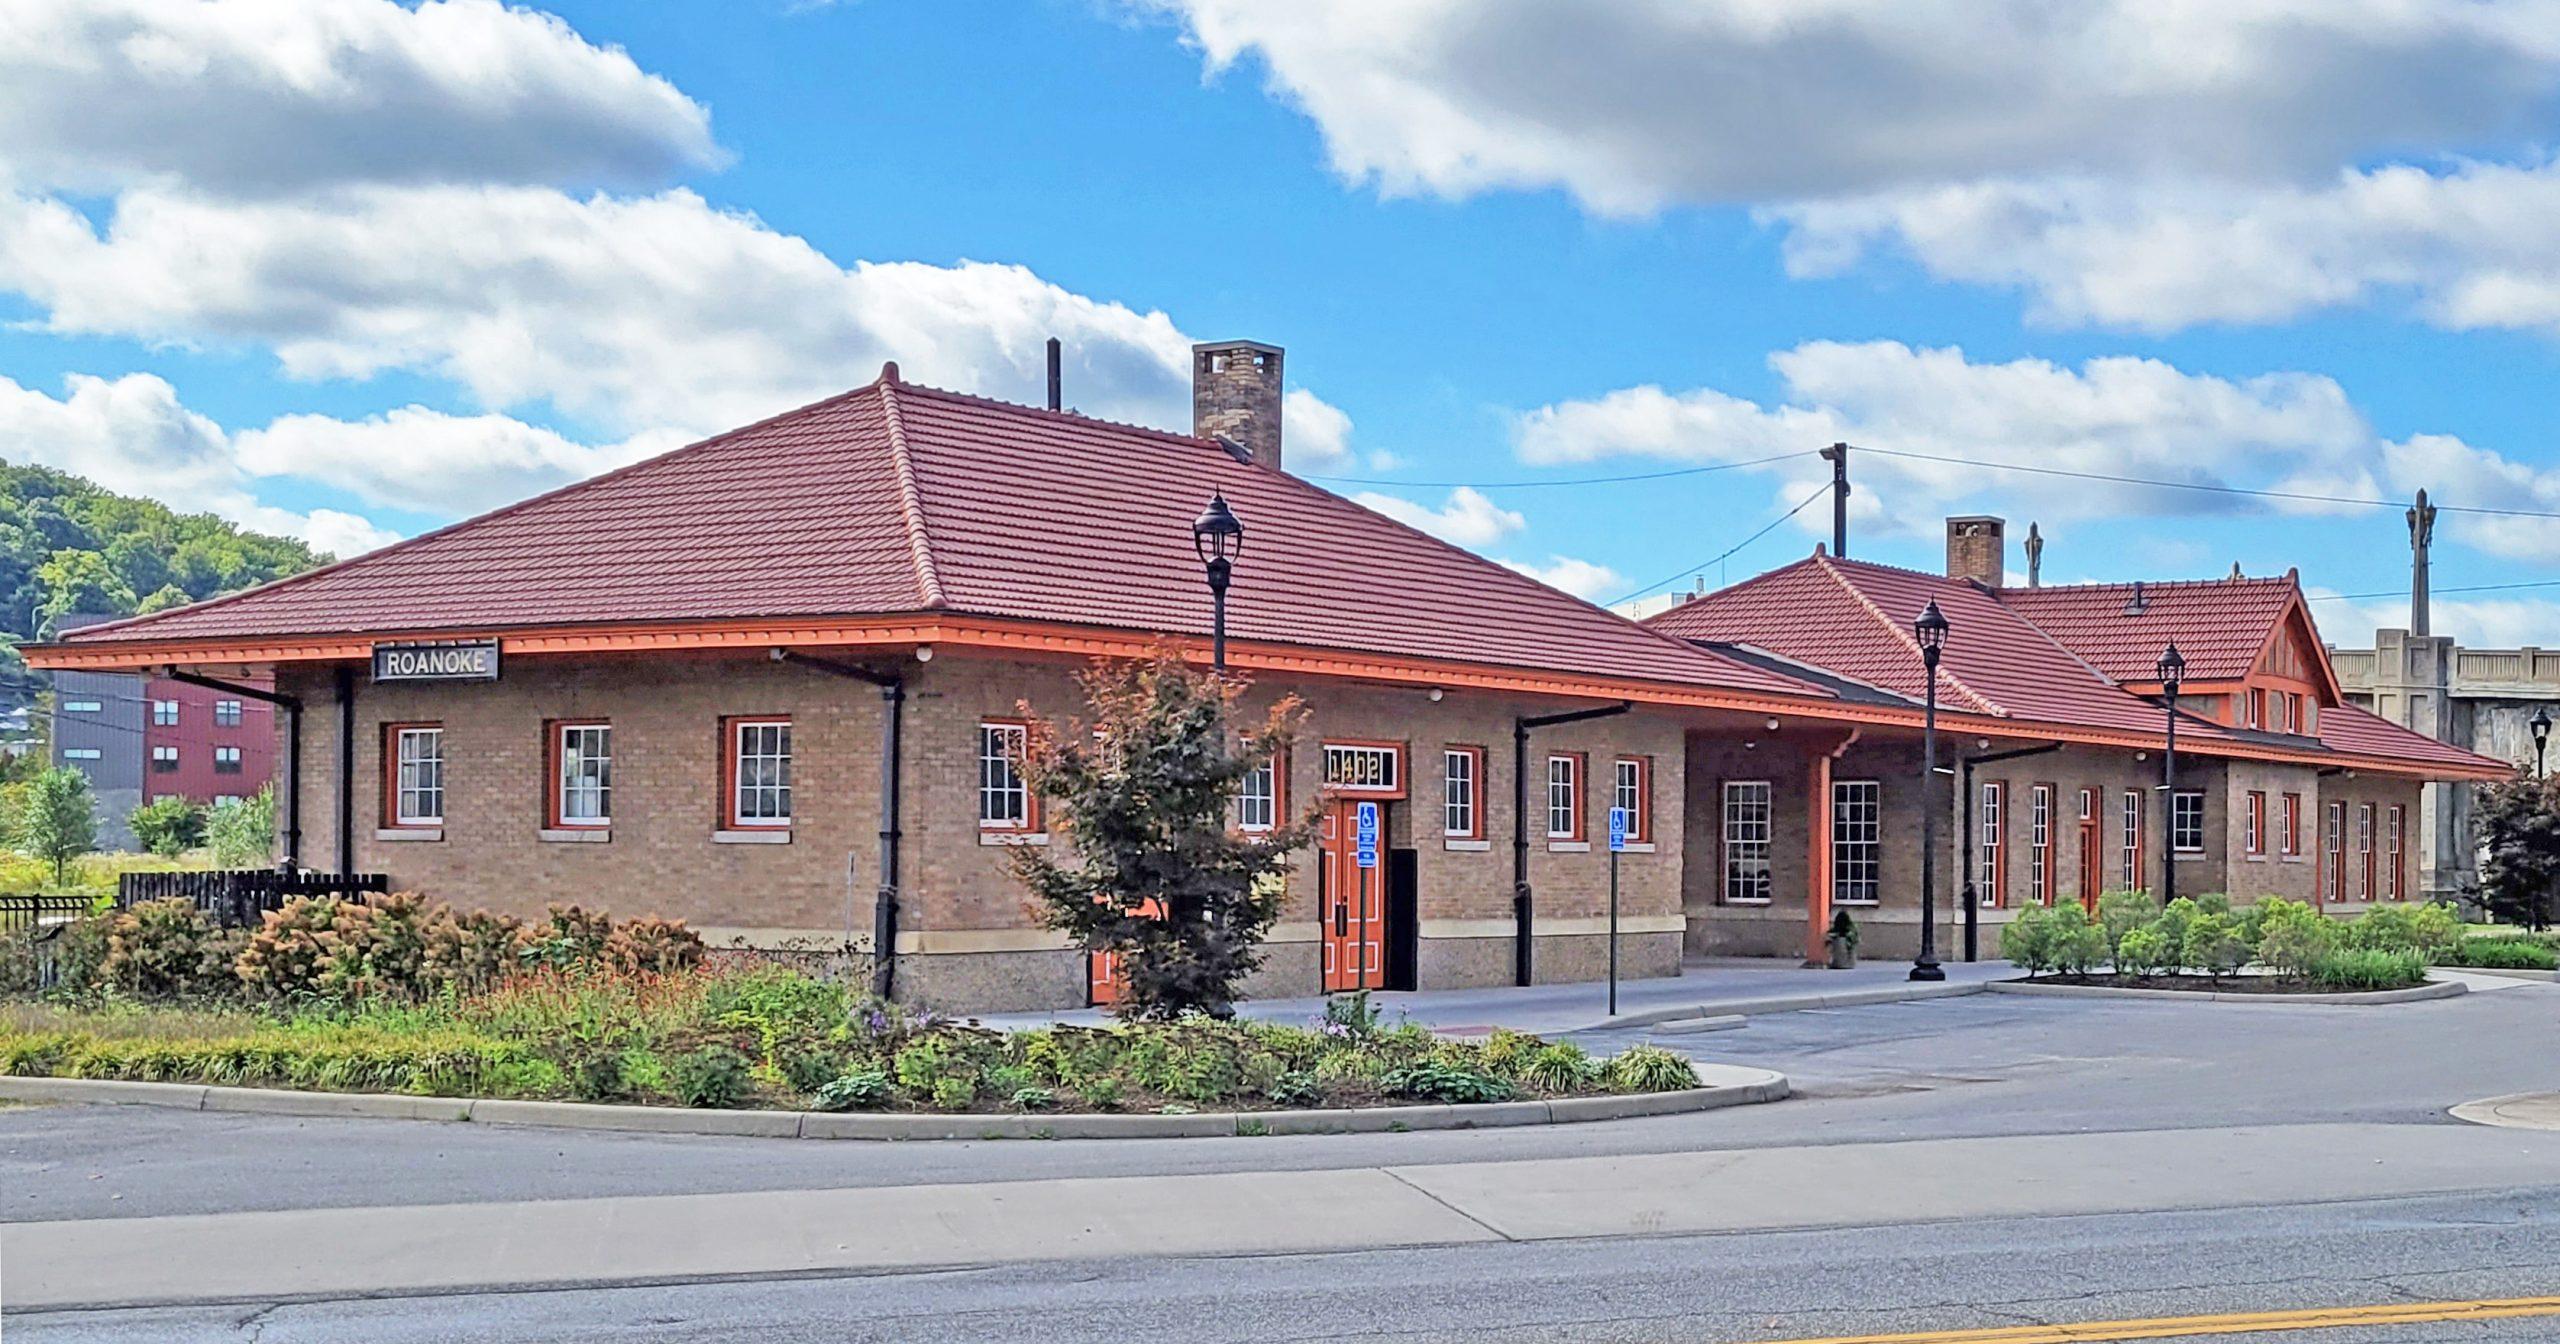 Virginian Railway Passenger Station